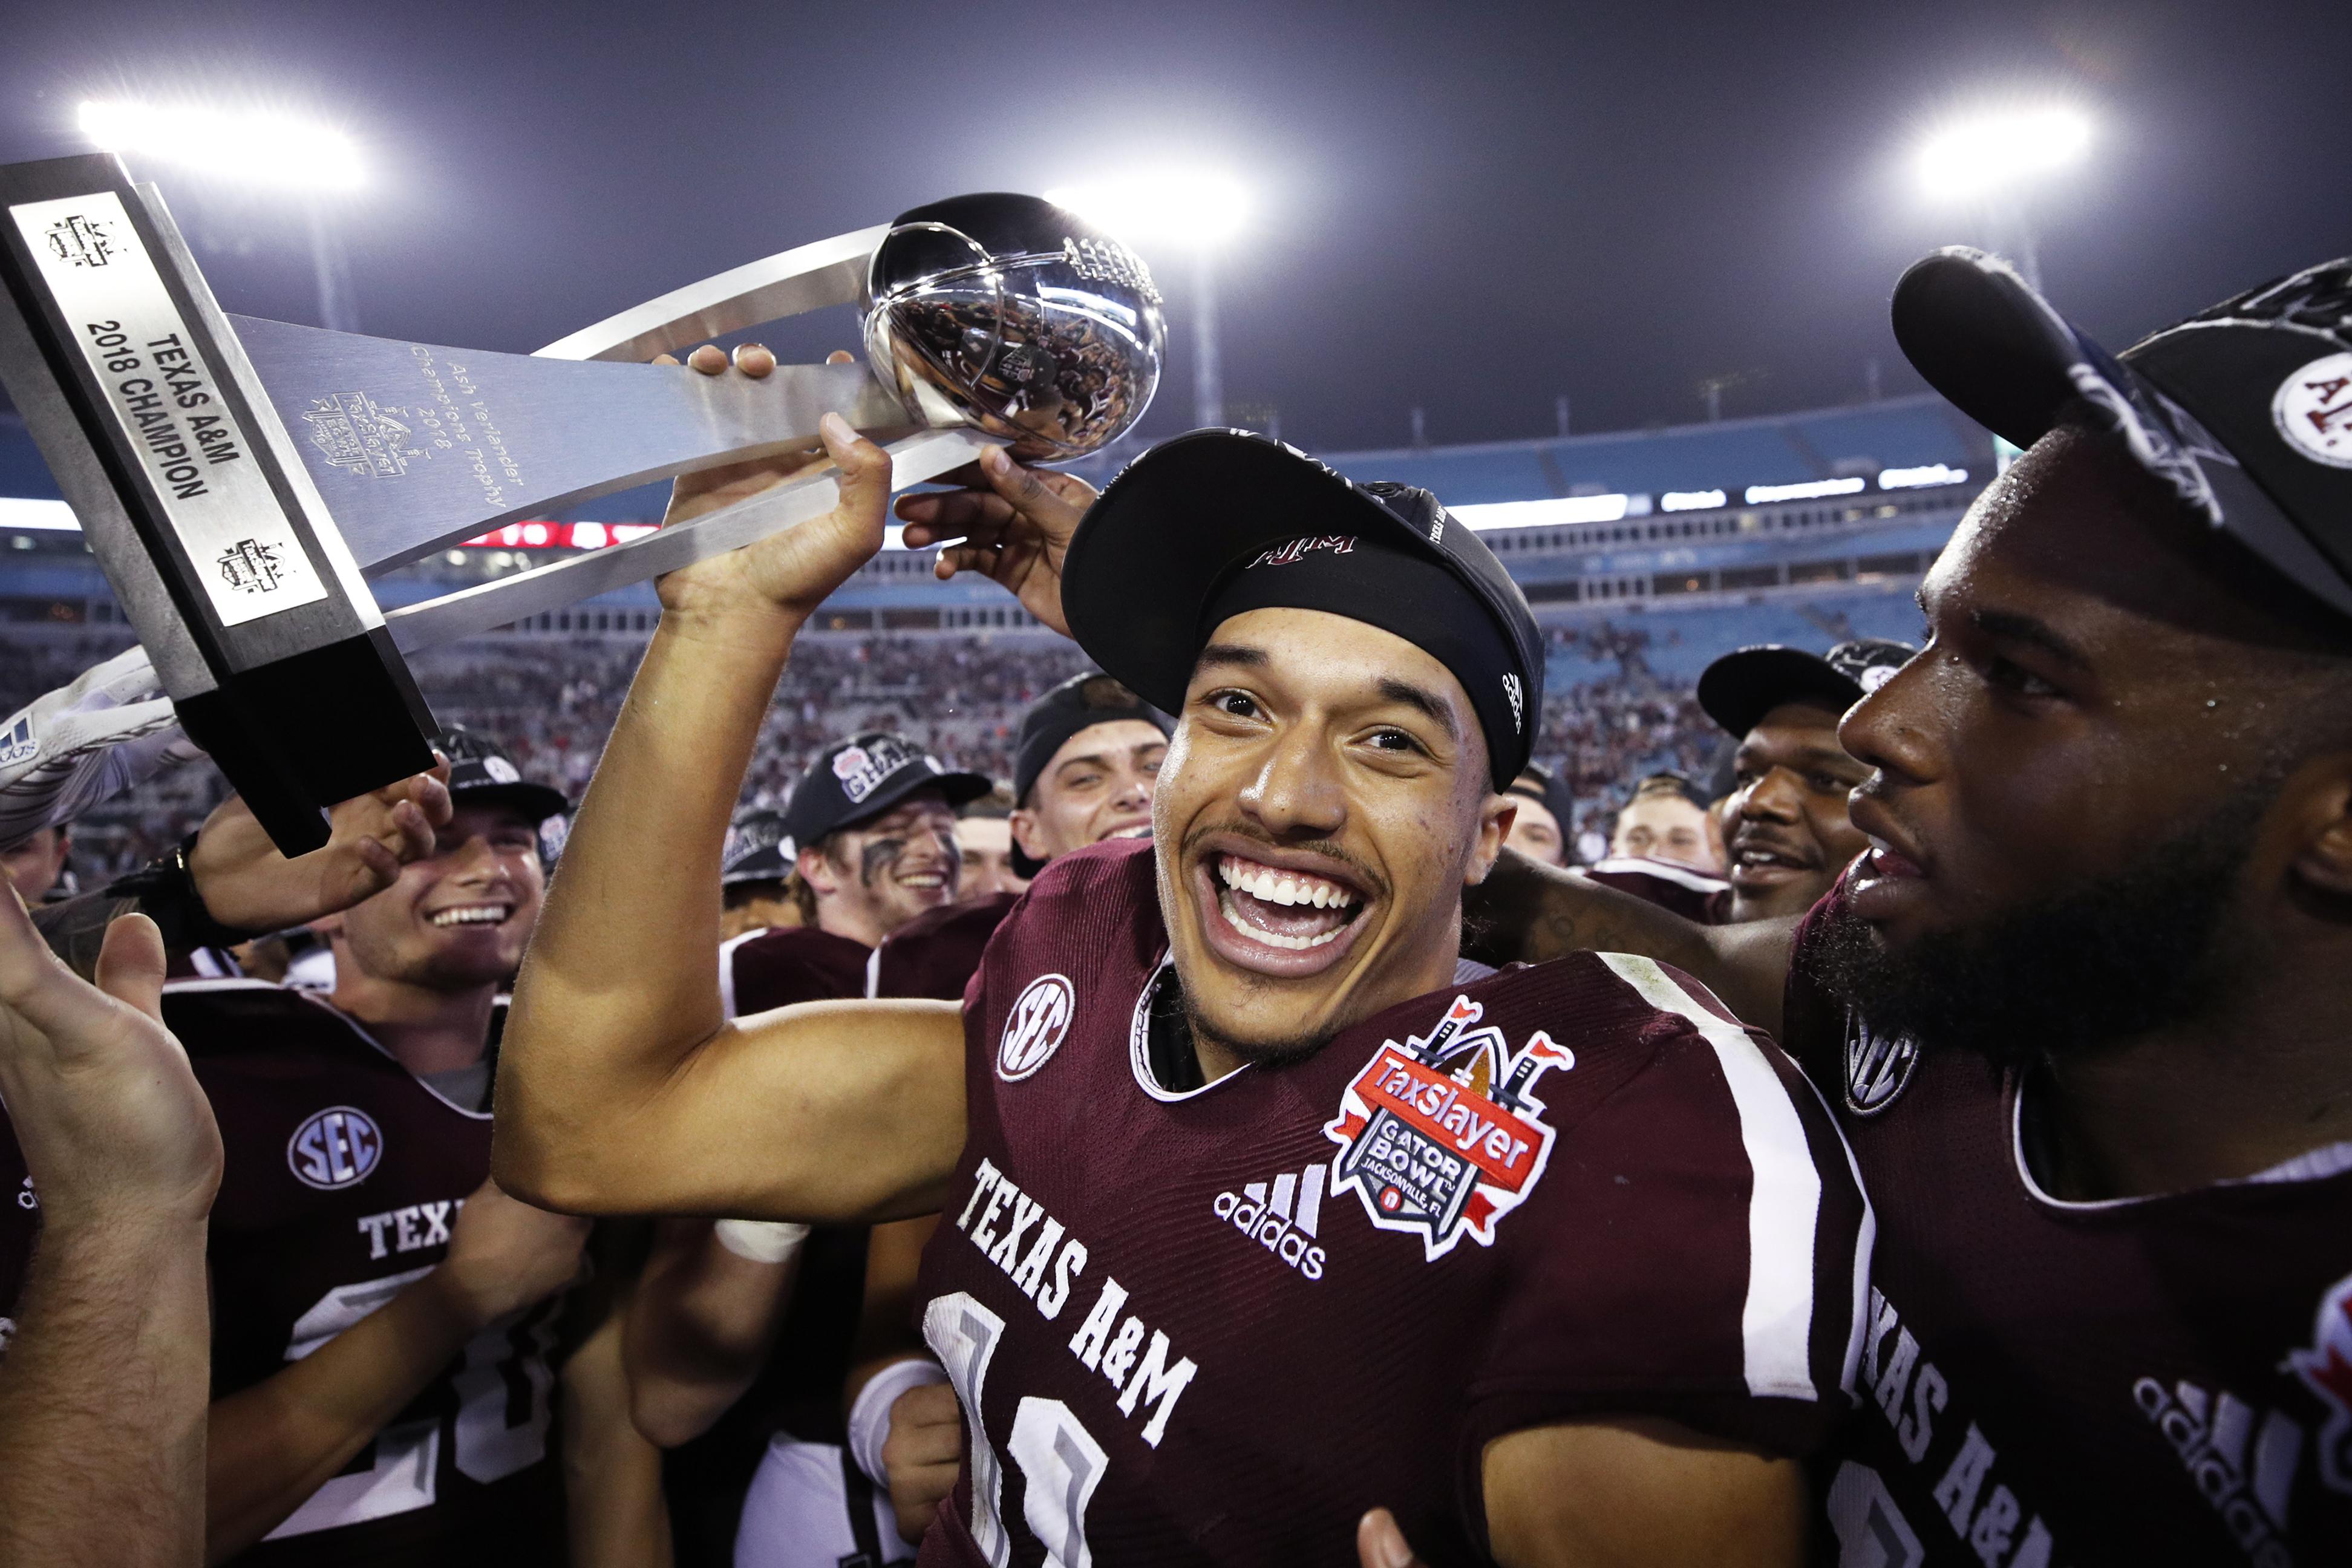 TaxSlayer Gator Bowl - North Carolina State v Texas A&M